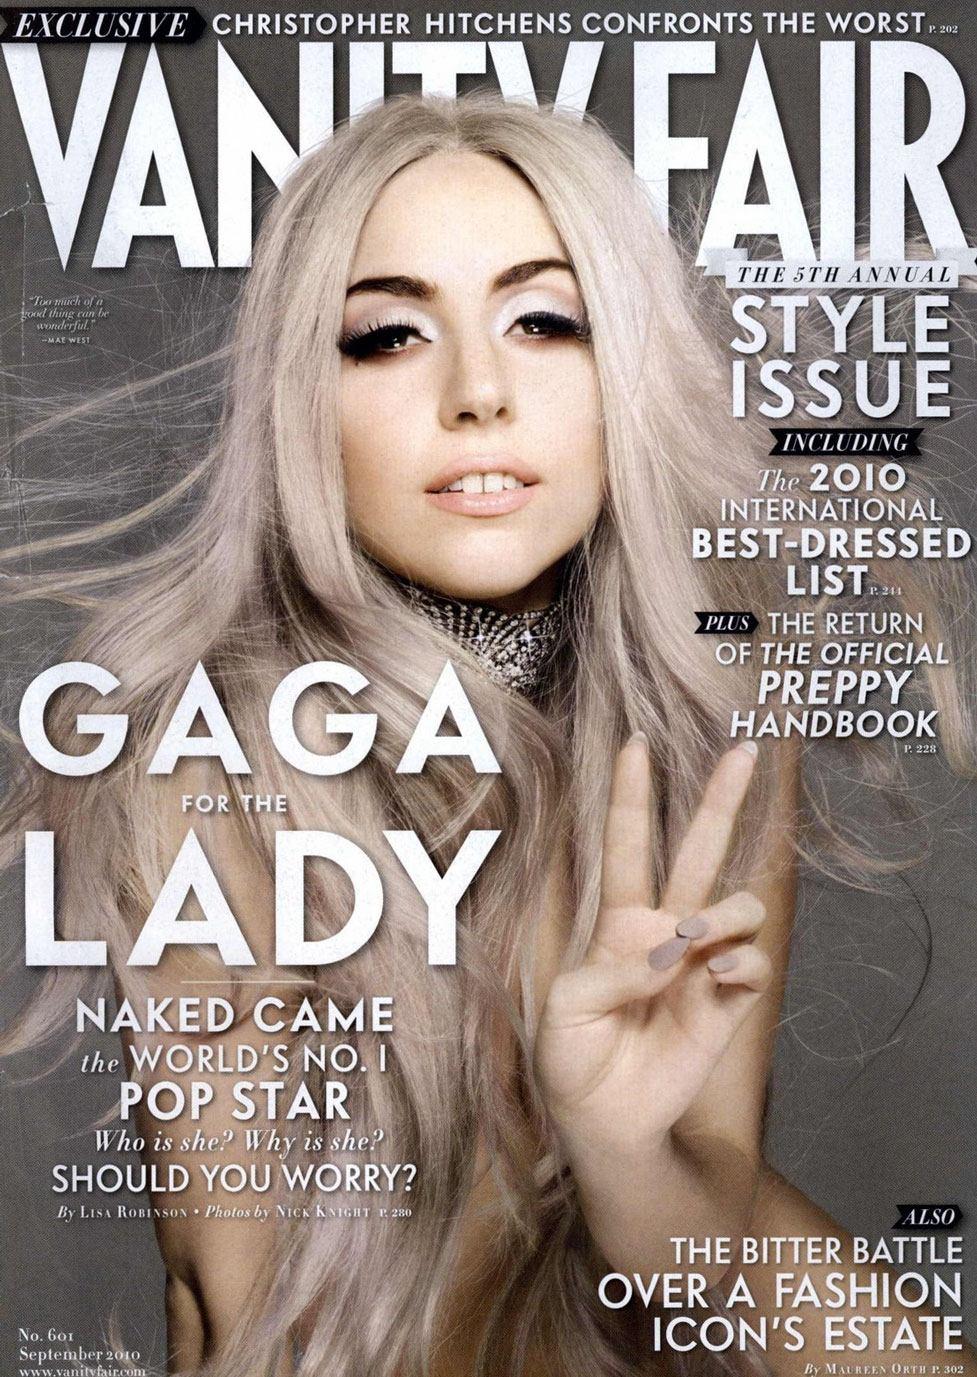 Леди Гага / Lady Gaga by Nick Knight in Vanity Fair